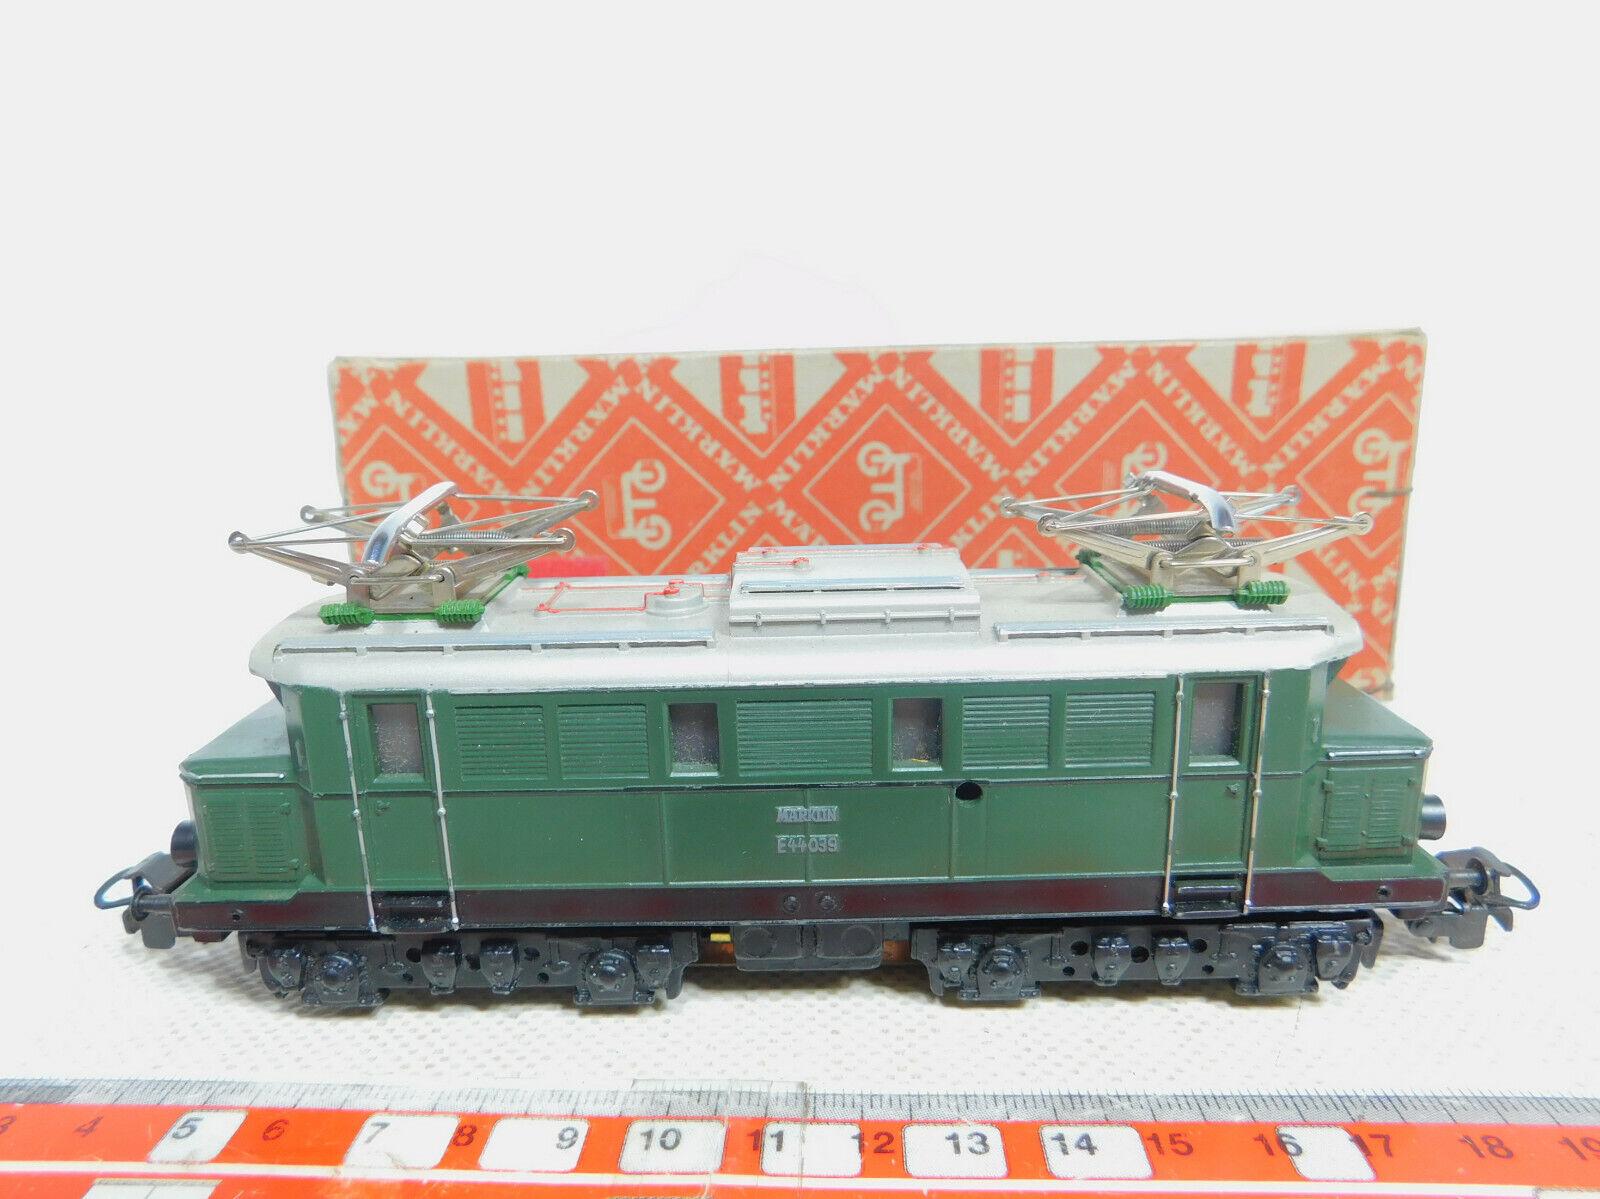 By325-2Märklin H0 Ac Set 800 3011 Guss-E-Lok E 44 039 Db Wide Ve, Good +Box